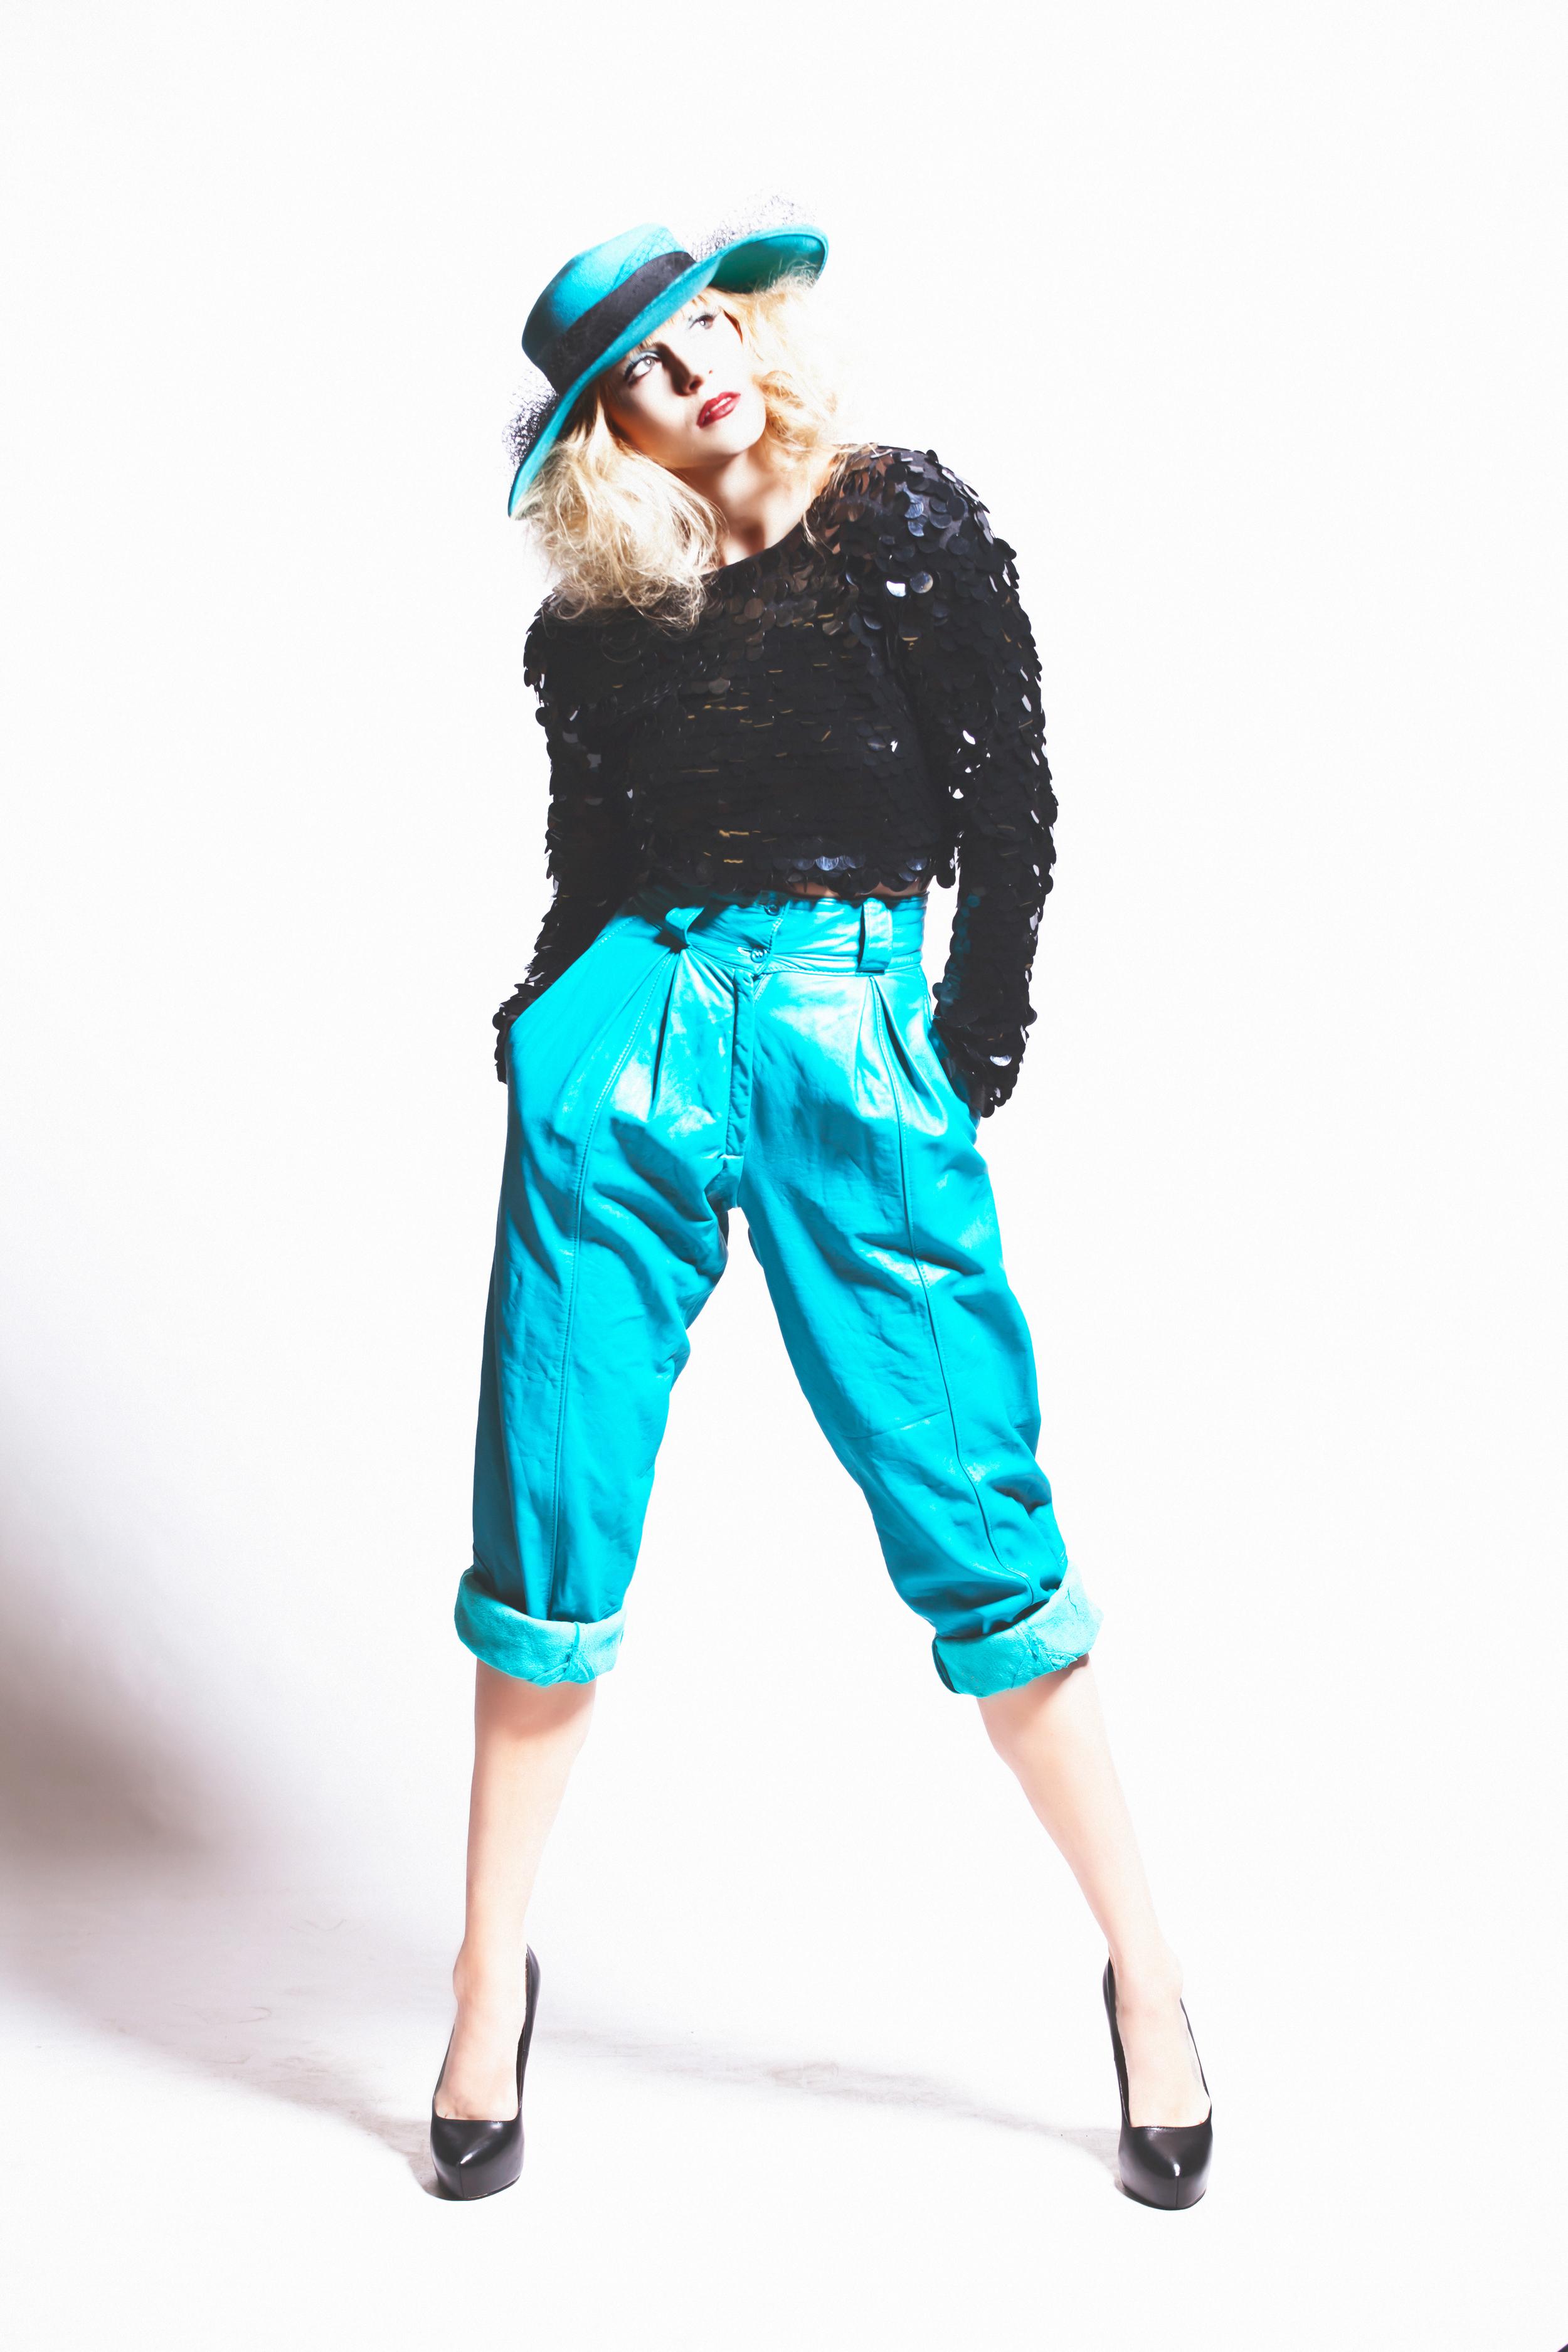 Model: Linzy Anna  Photo Credit: Smash Glam